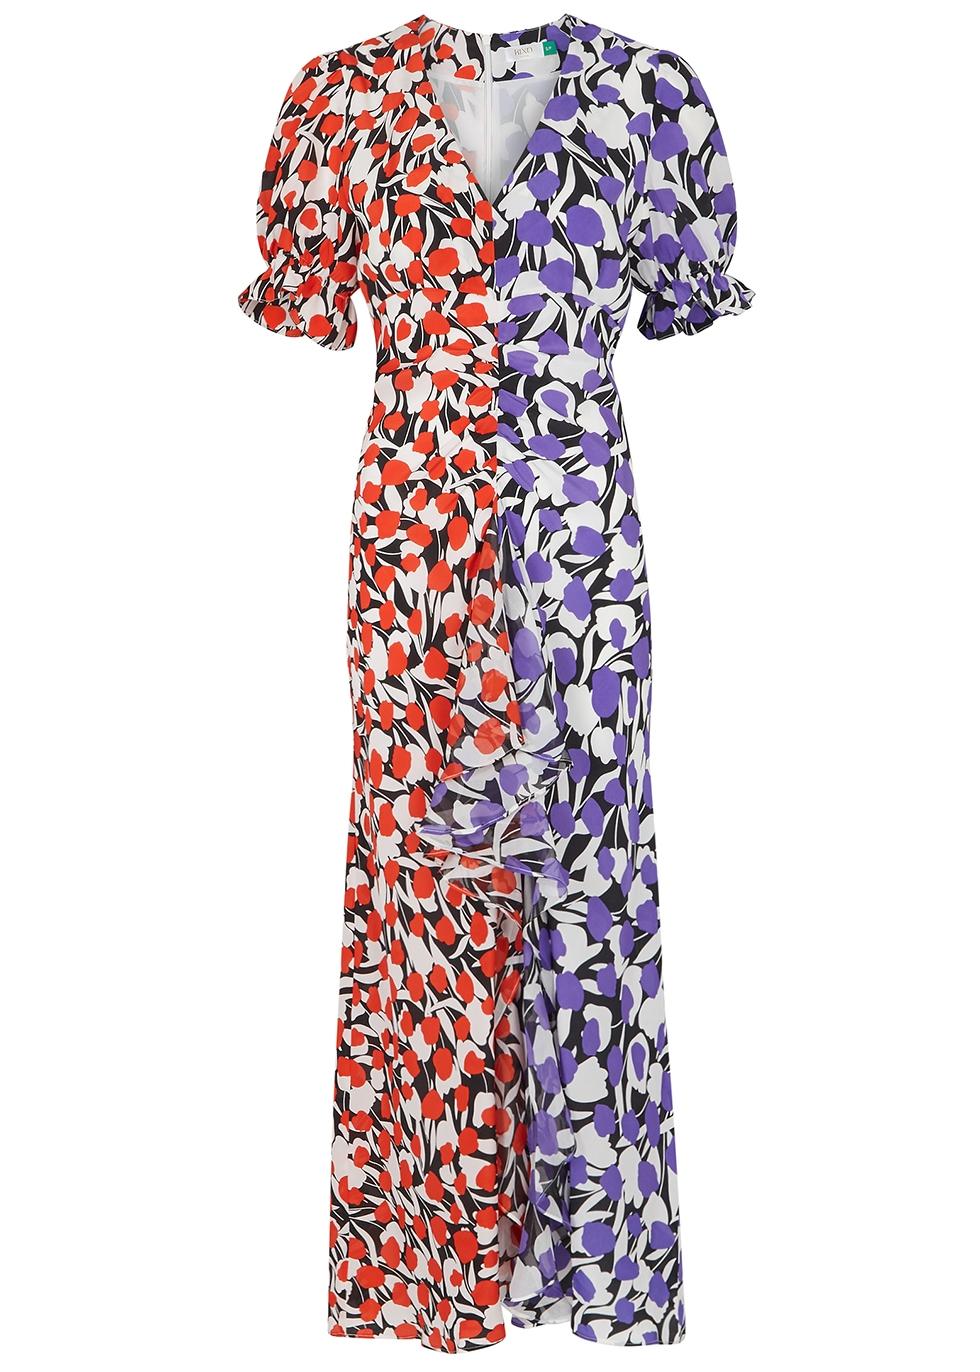 ac853c23a Designer Dresses   Designer Gowns - Harvey Nichols